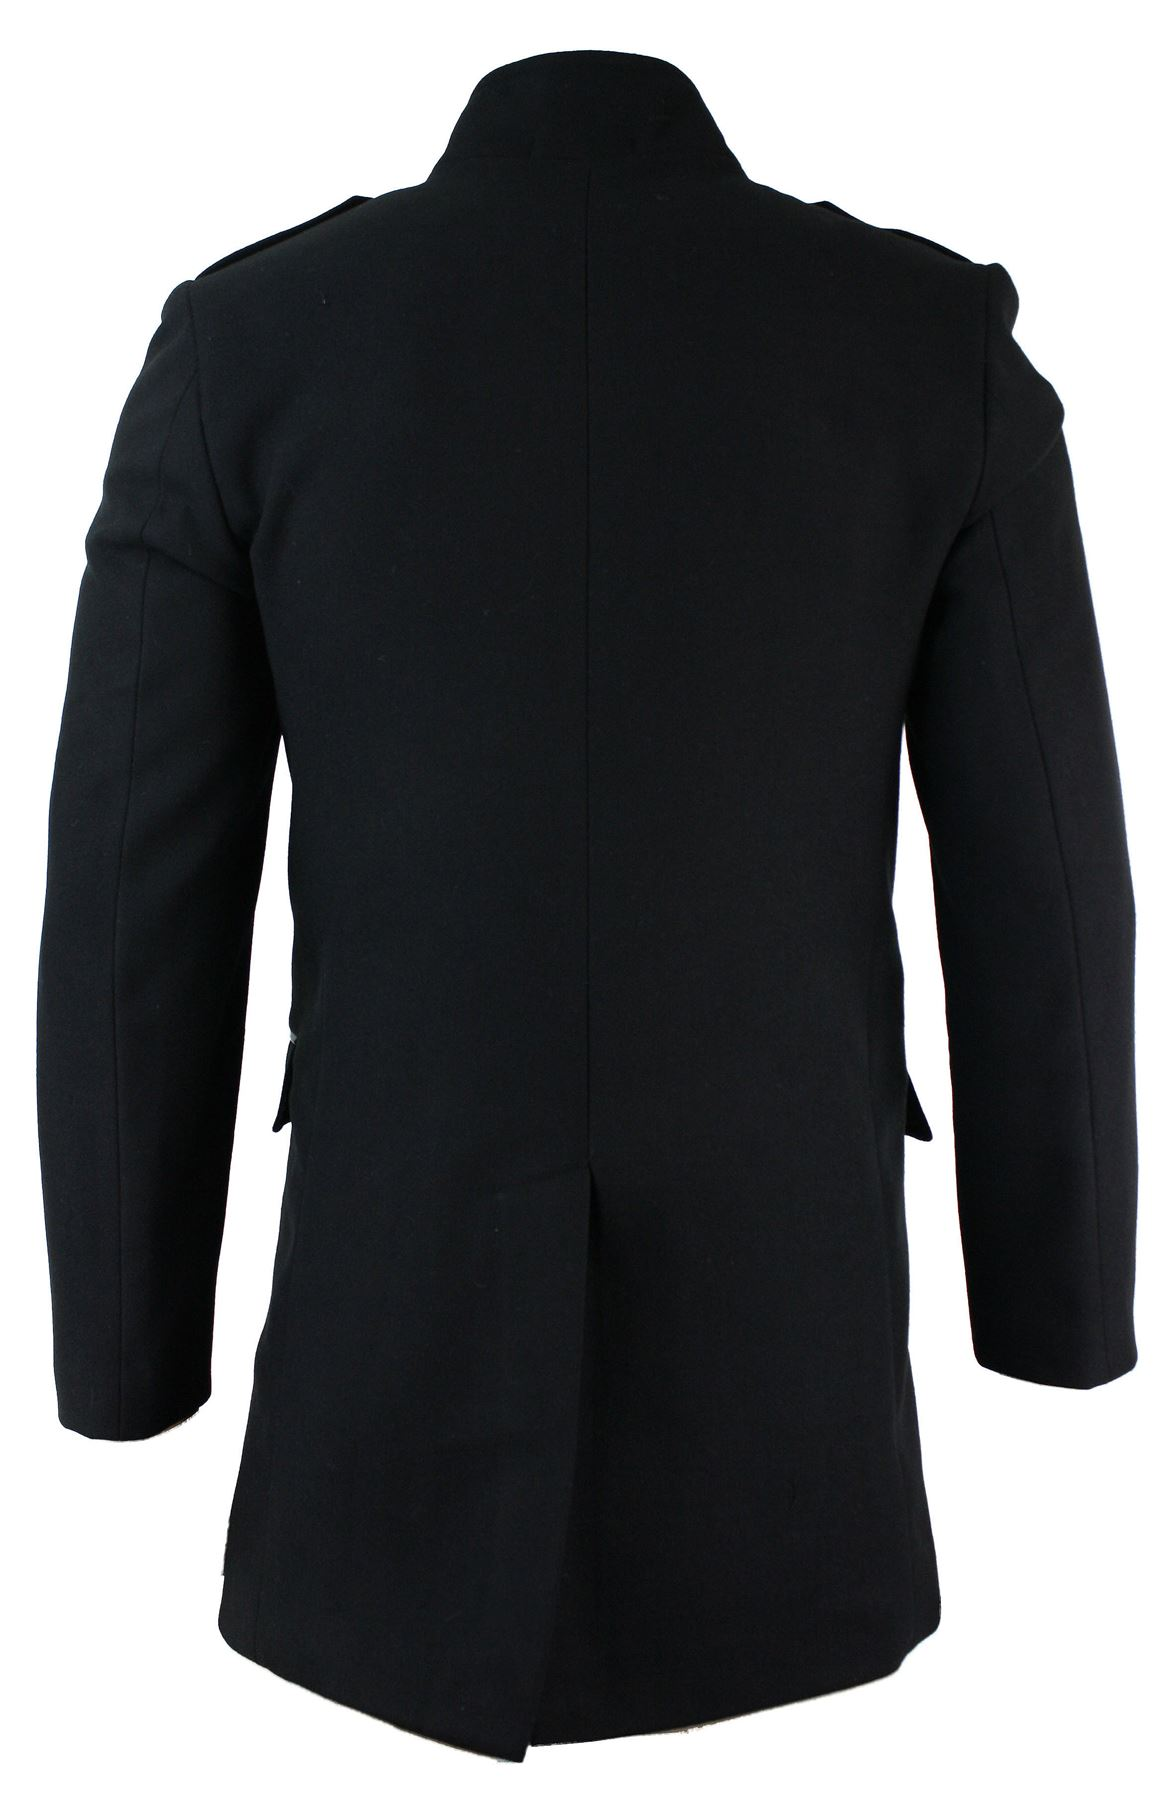 Mens military style overcoat